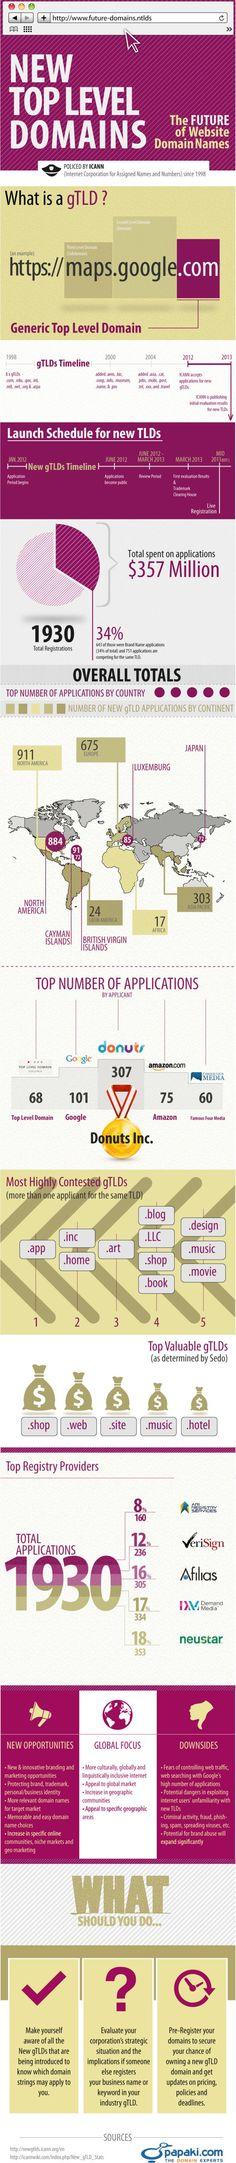 The future of Website domain names #infografia #infographic